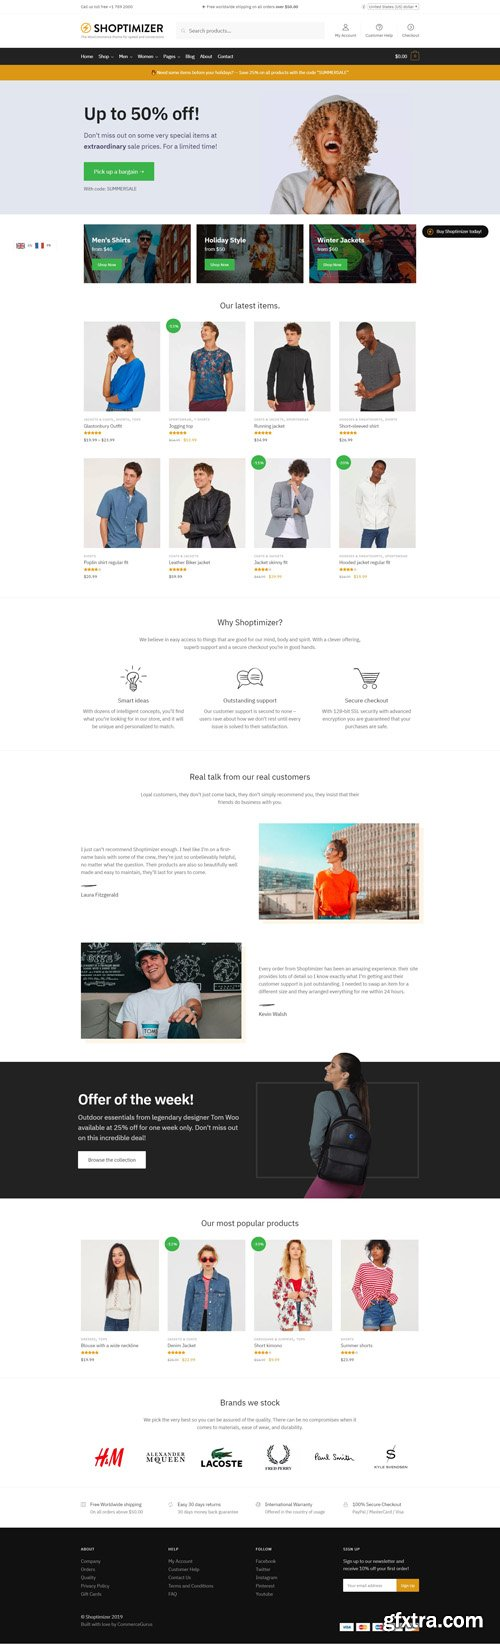 Shoptimizer v1.7.6 - Fastest WooCommerce WordPress Theme